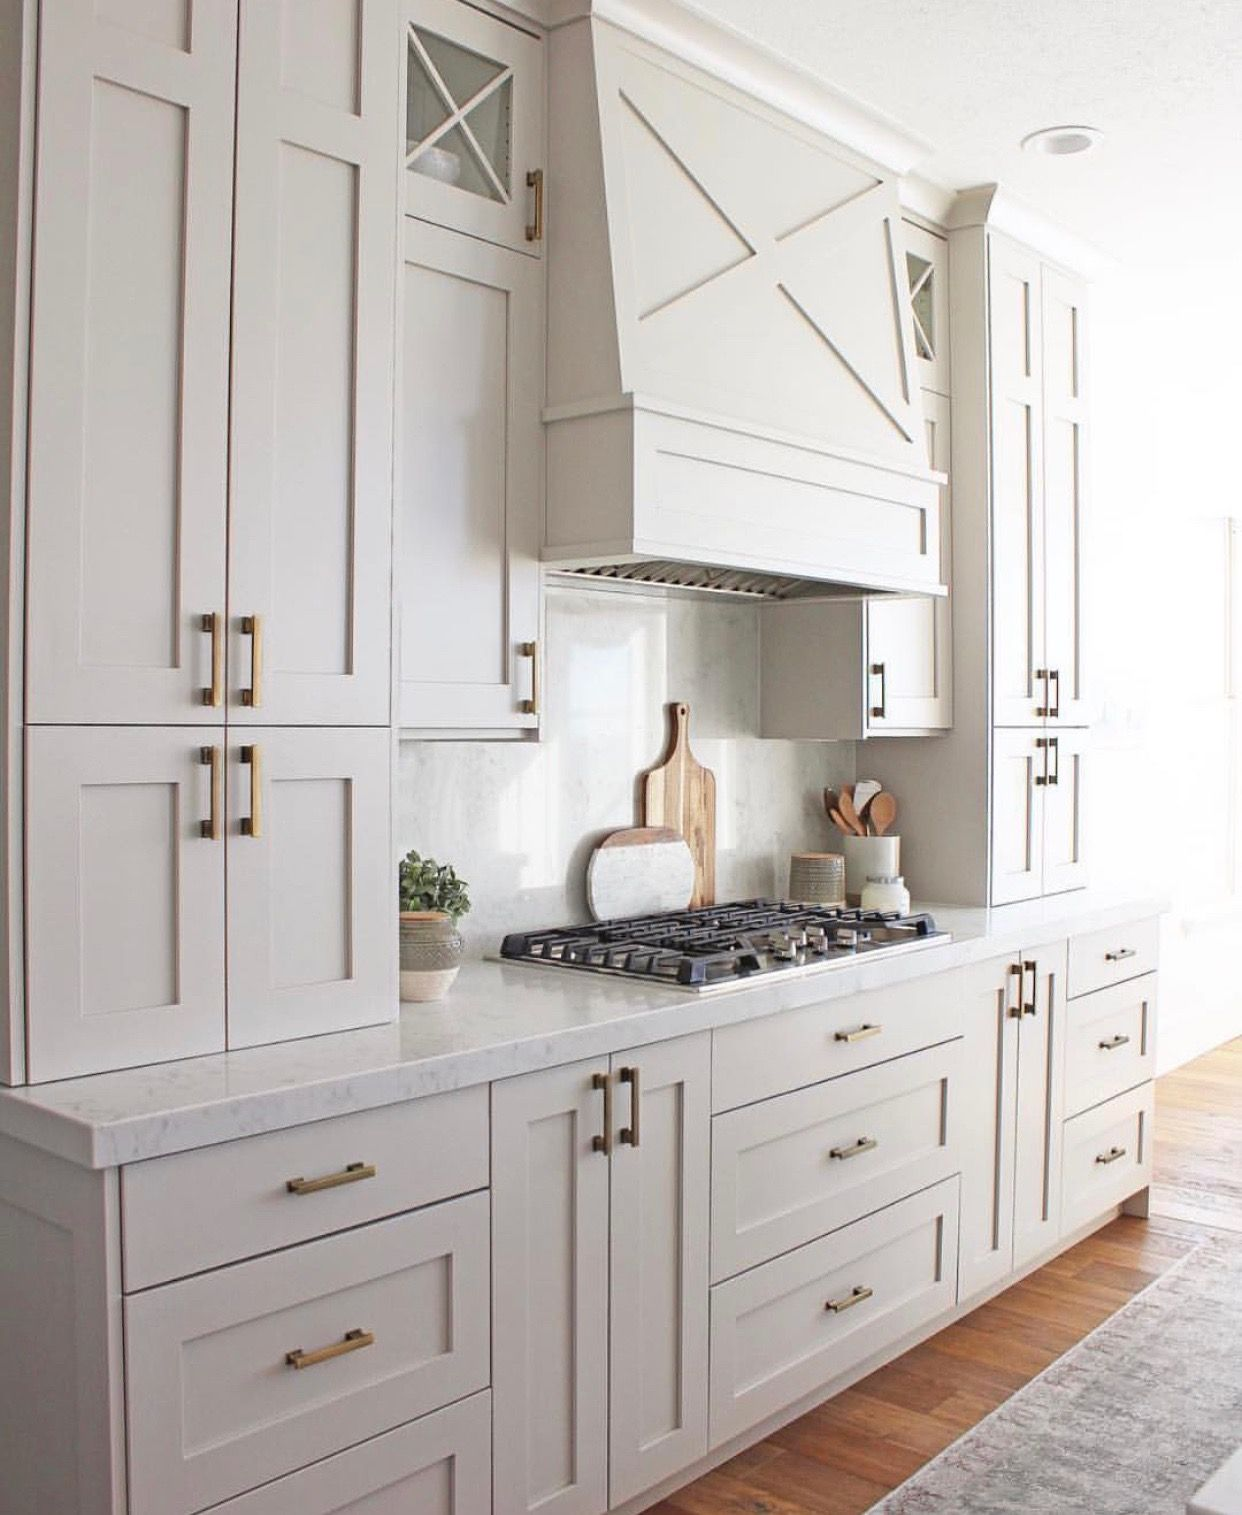 Sherwin Williams Repose Gray Diy Kitchen Renovation Kitchen Renovation New Kitchen Cabinets